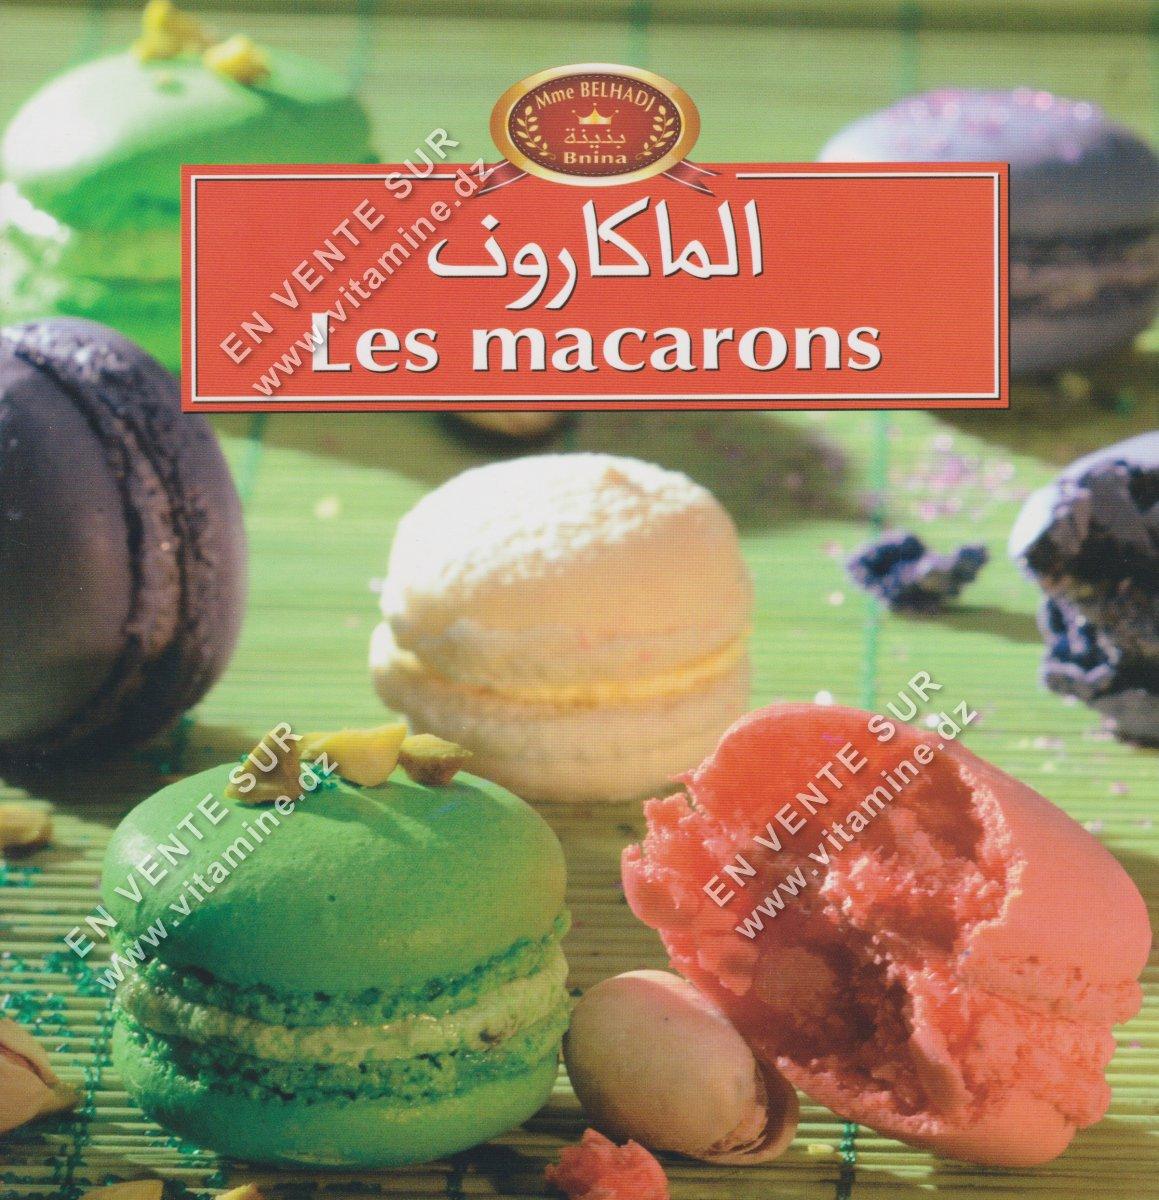 Bnina - Les macarons